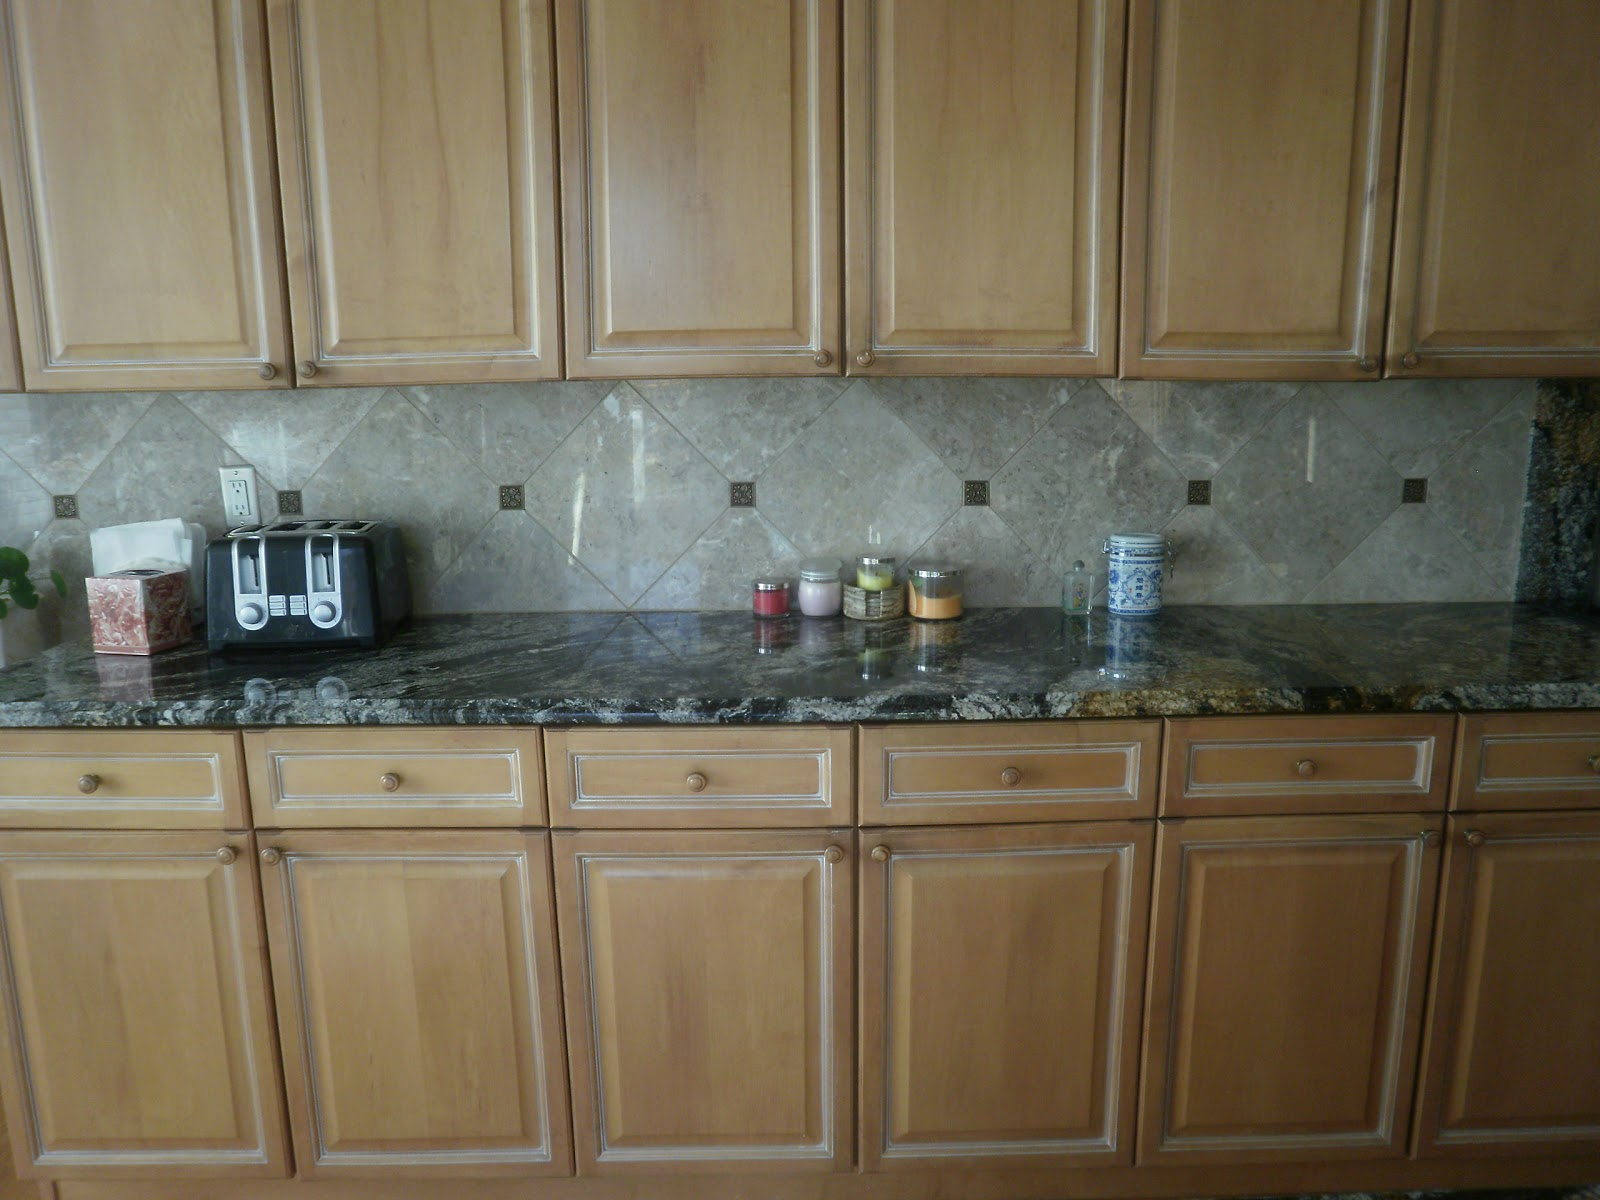 Integrity installations a division of front range backsplash whole house remodel - Images of kitchen backsplashes ...